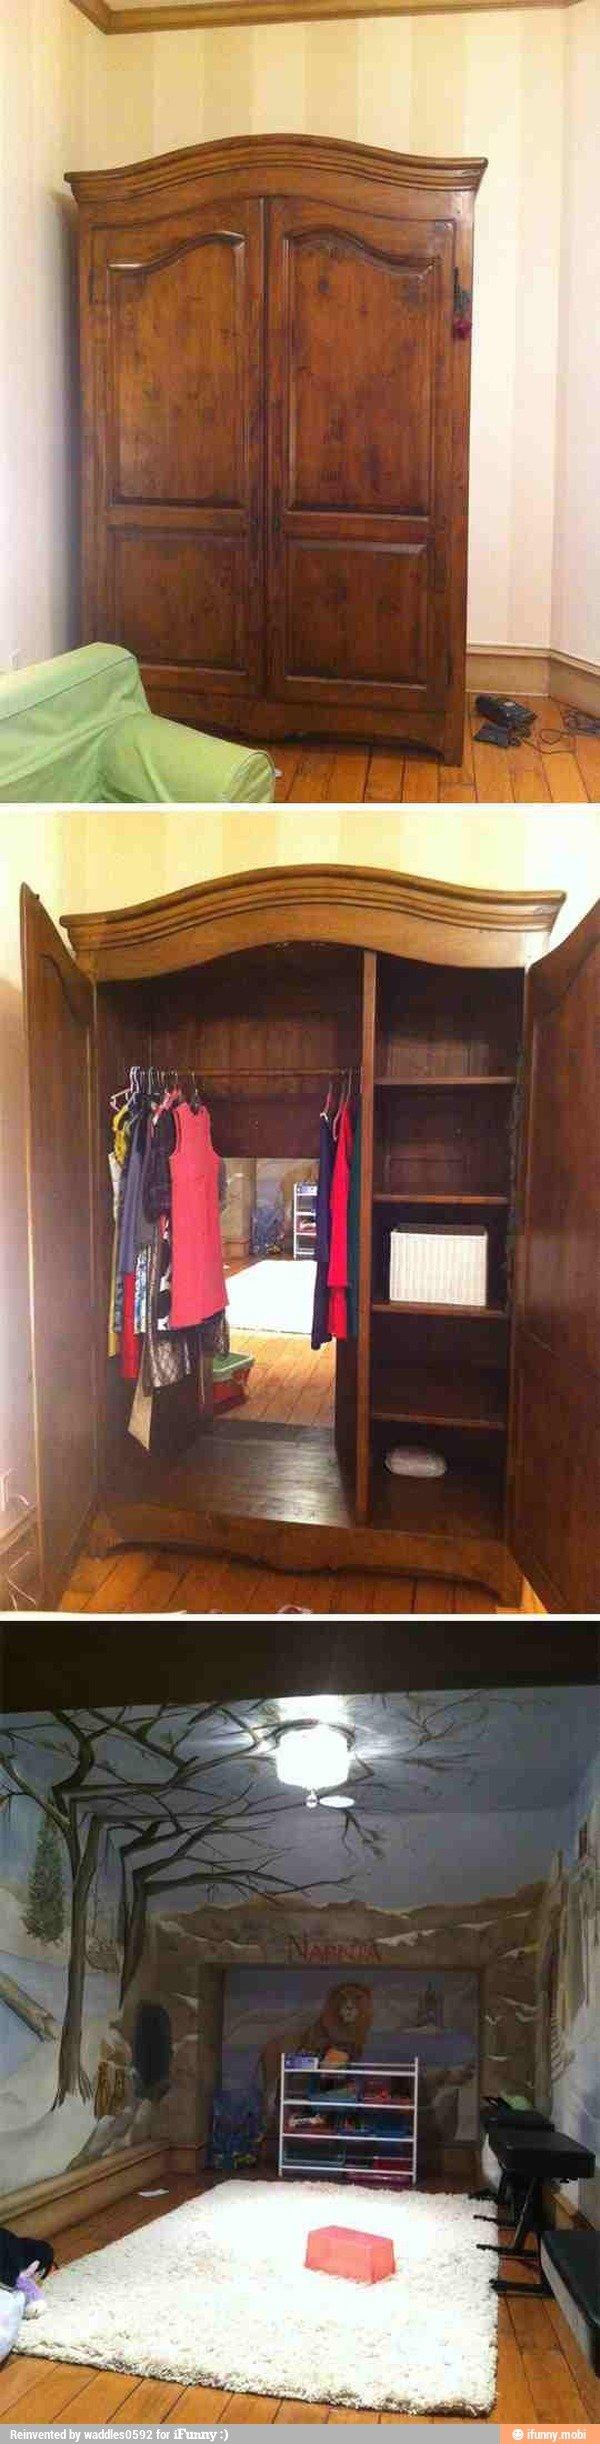 Want. . closet to Narnia